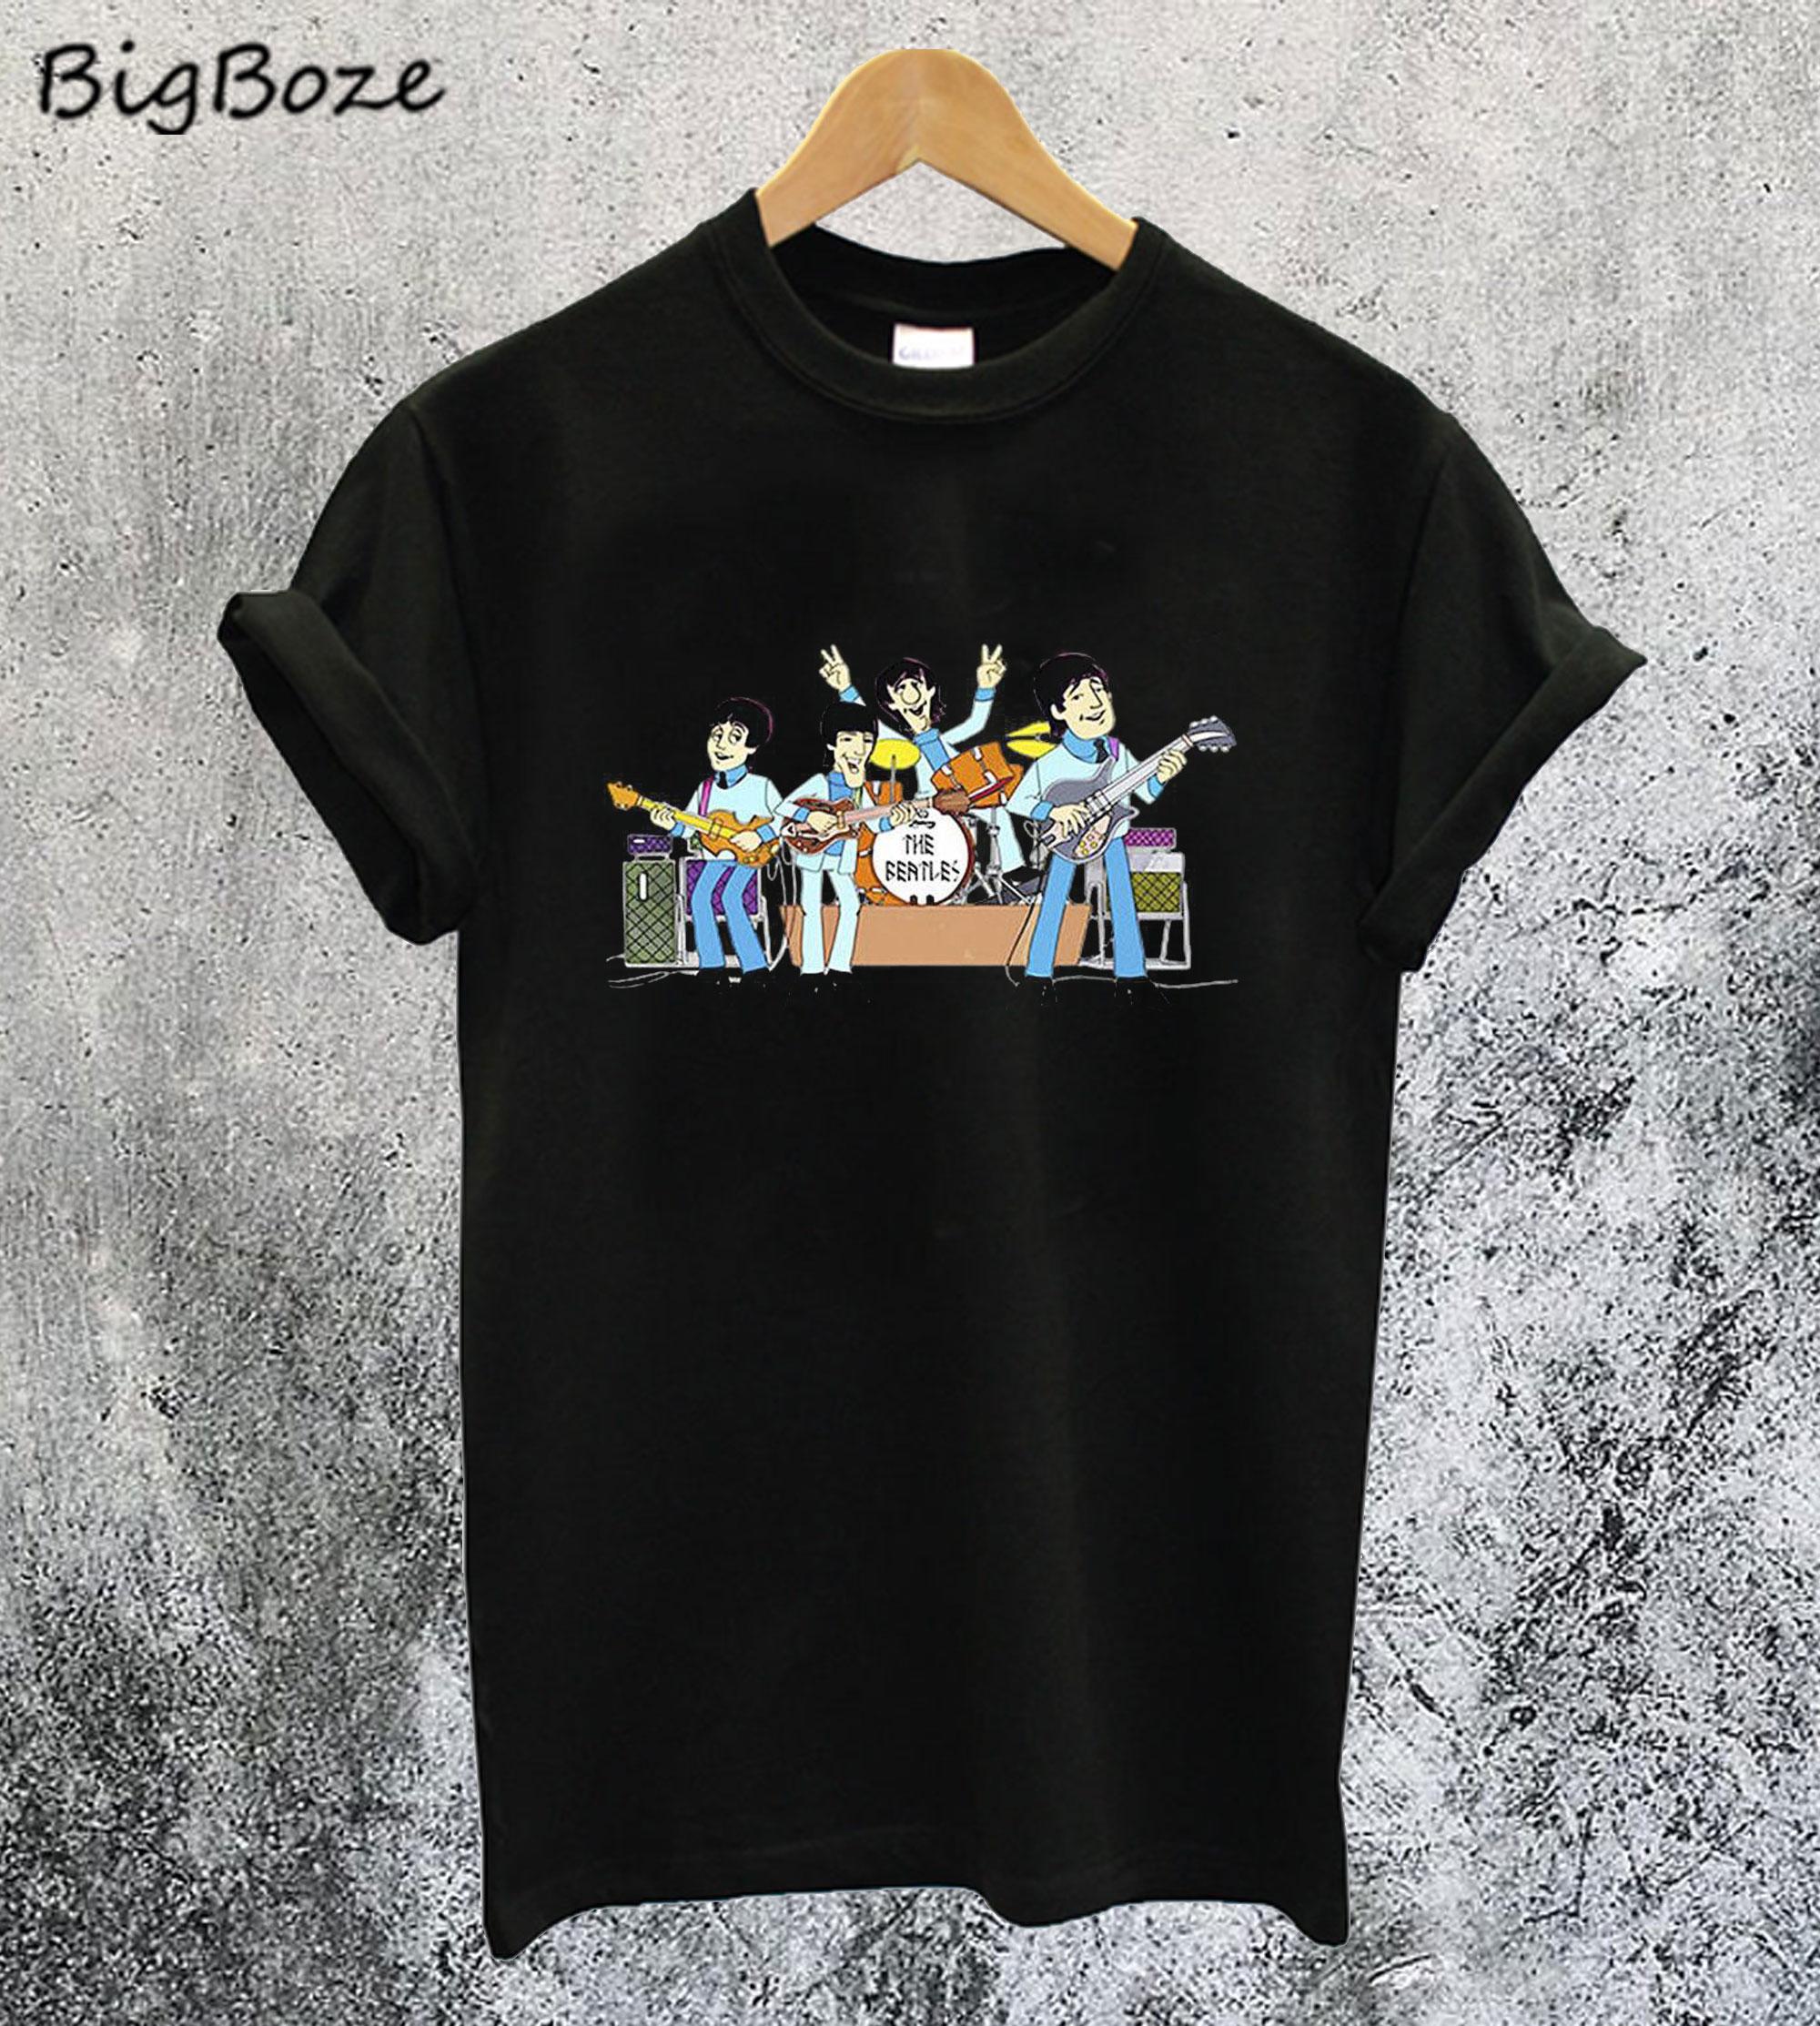 The Beatles Cartoon T-Shirt